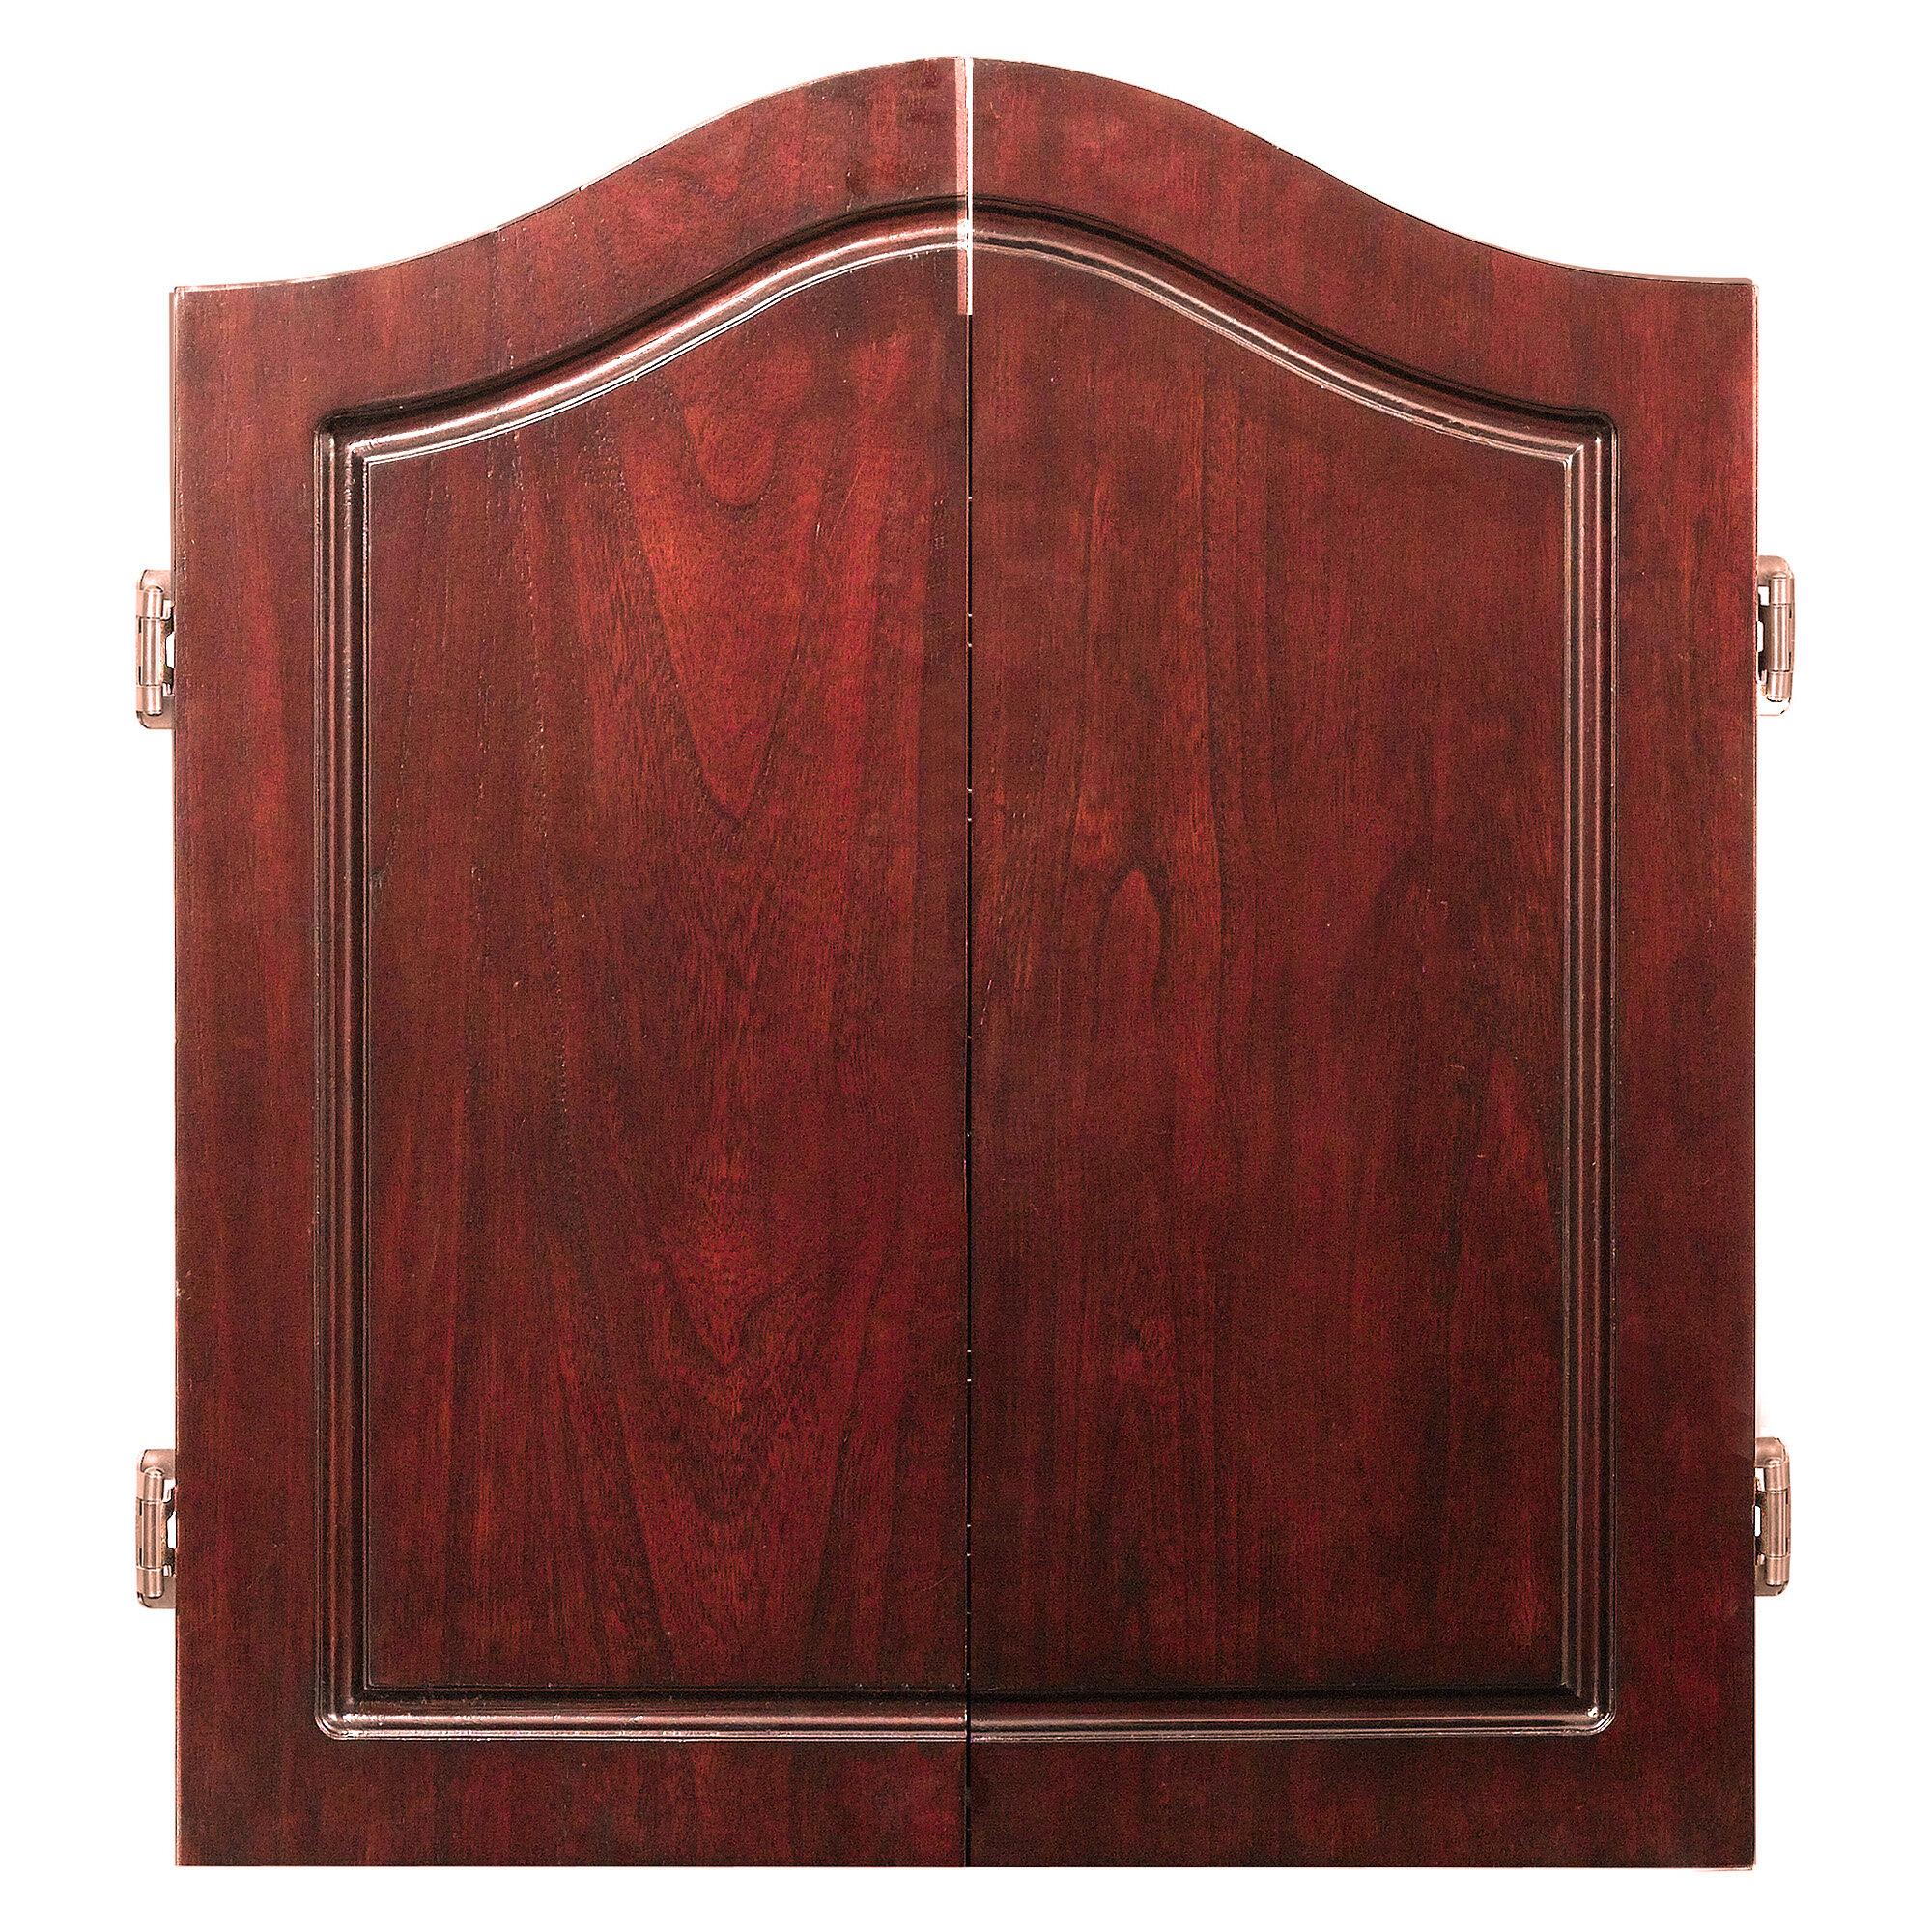 Centerpoint Solid Wood Dartboard U0026 Cabinet Set